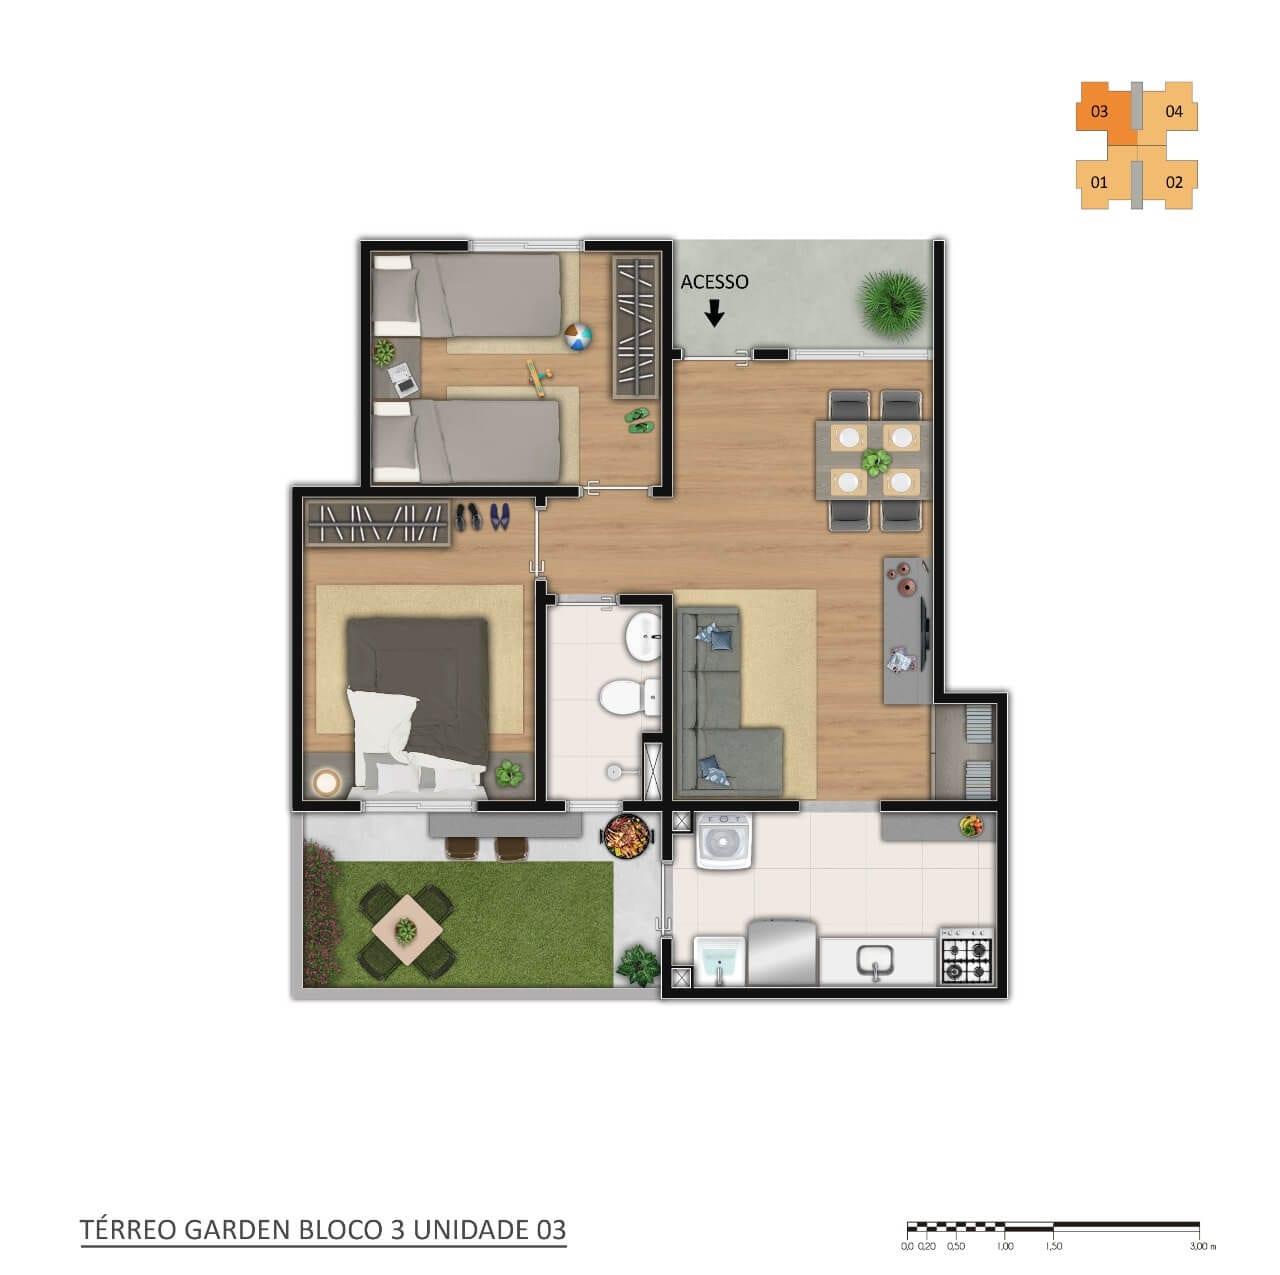 vic-engenharia-villa-vic-bilbao-apartamento-terreo-bloco-3-a-30